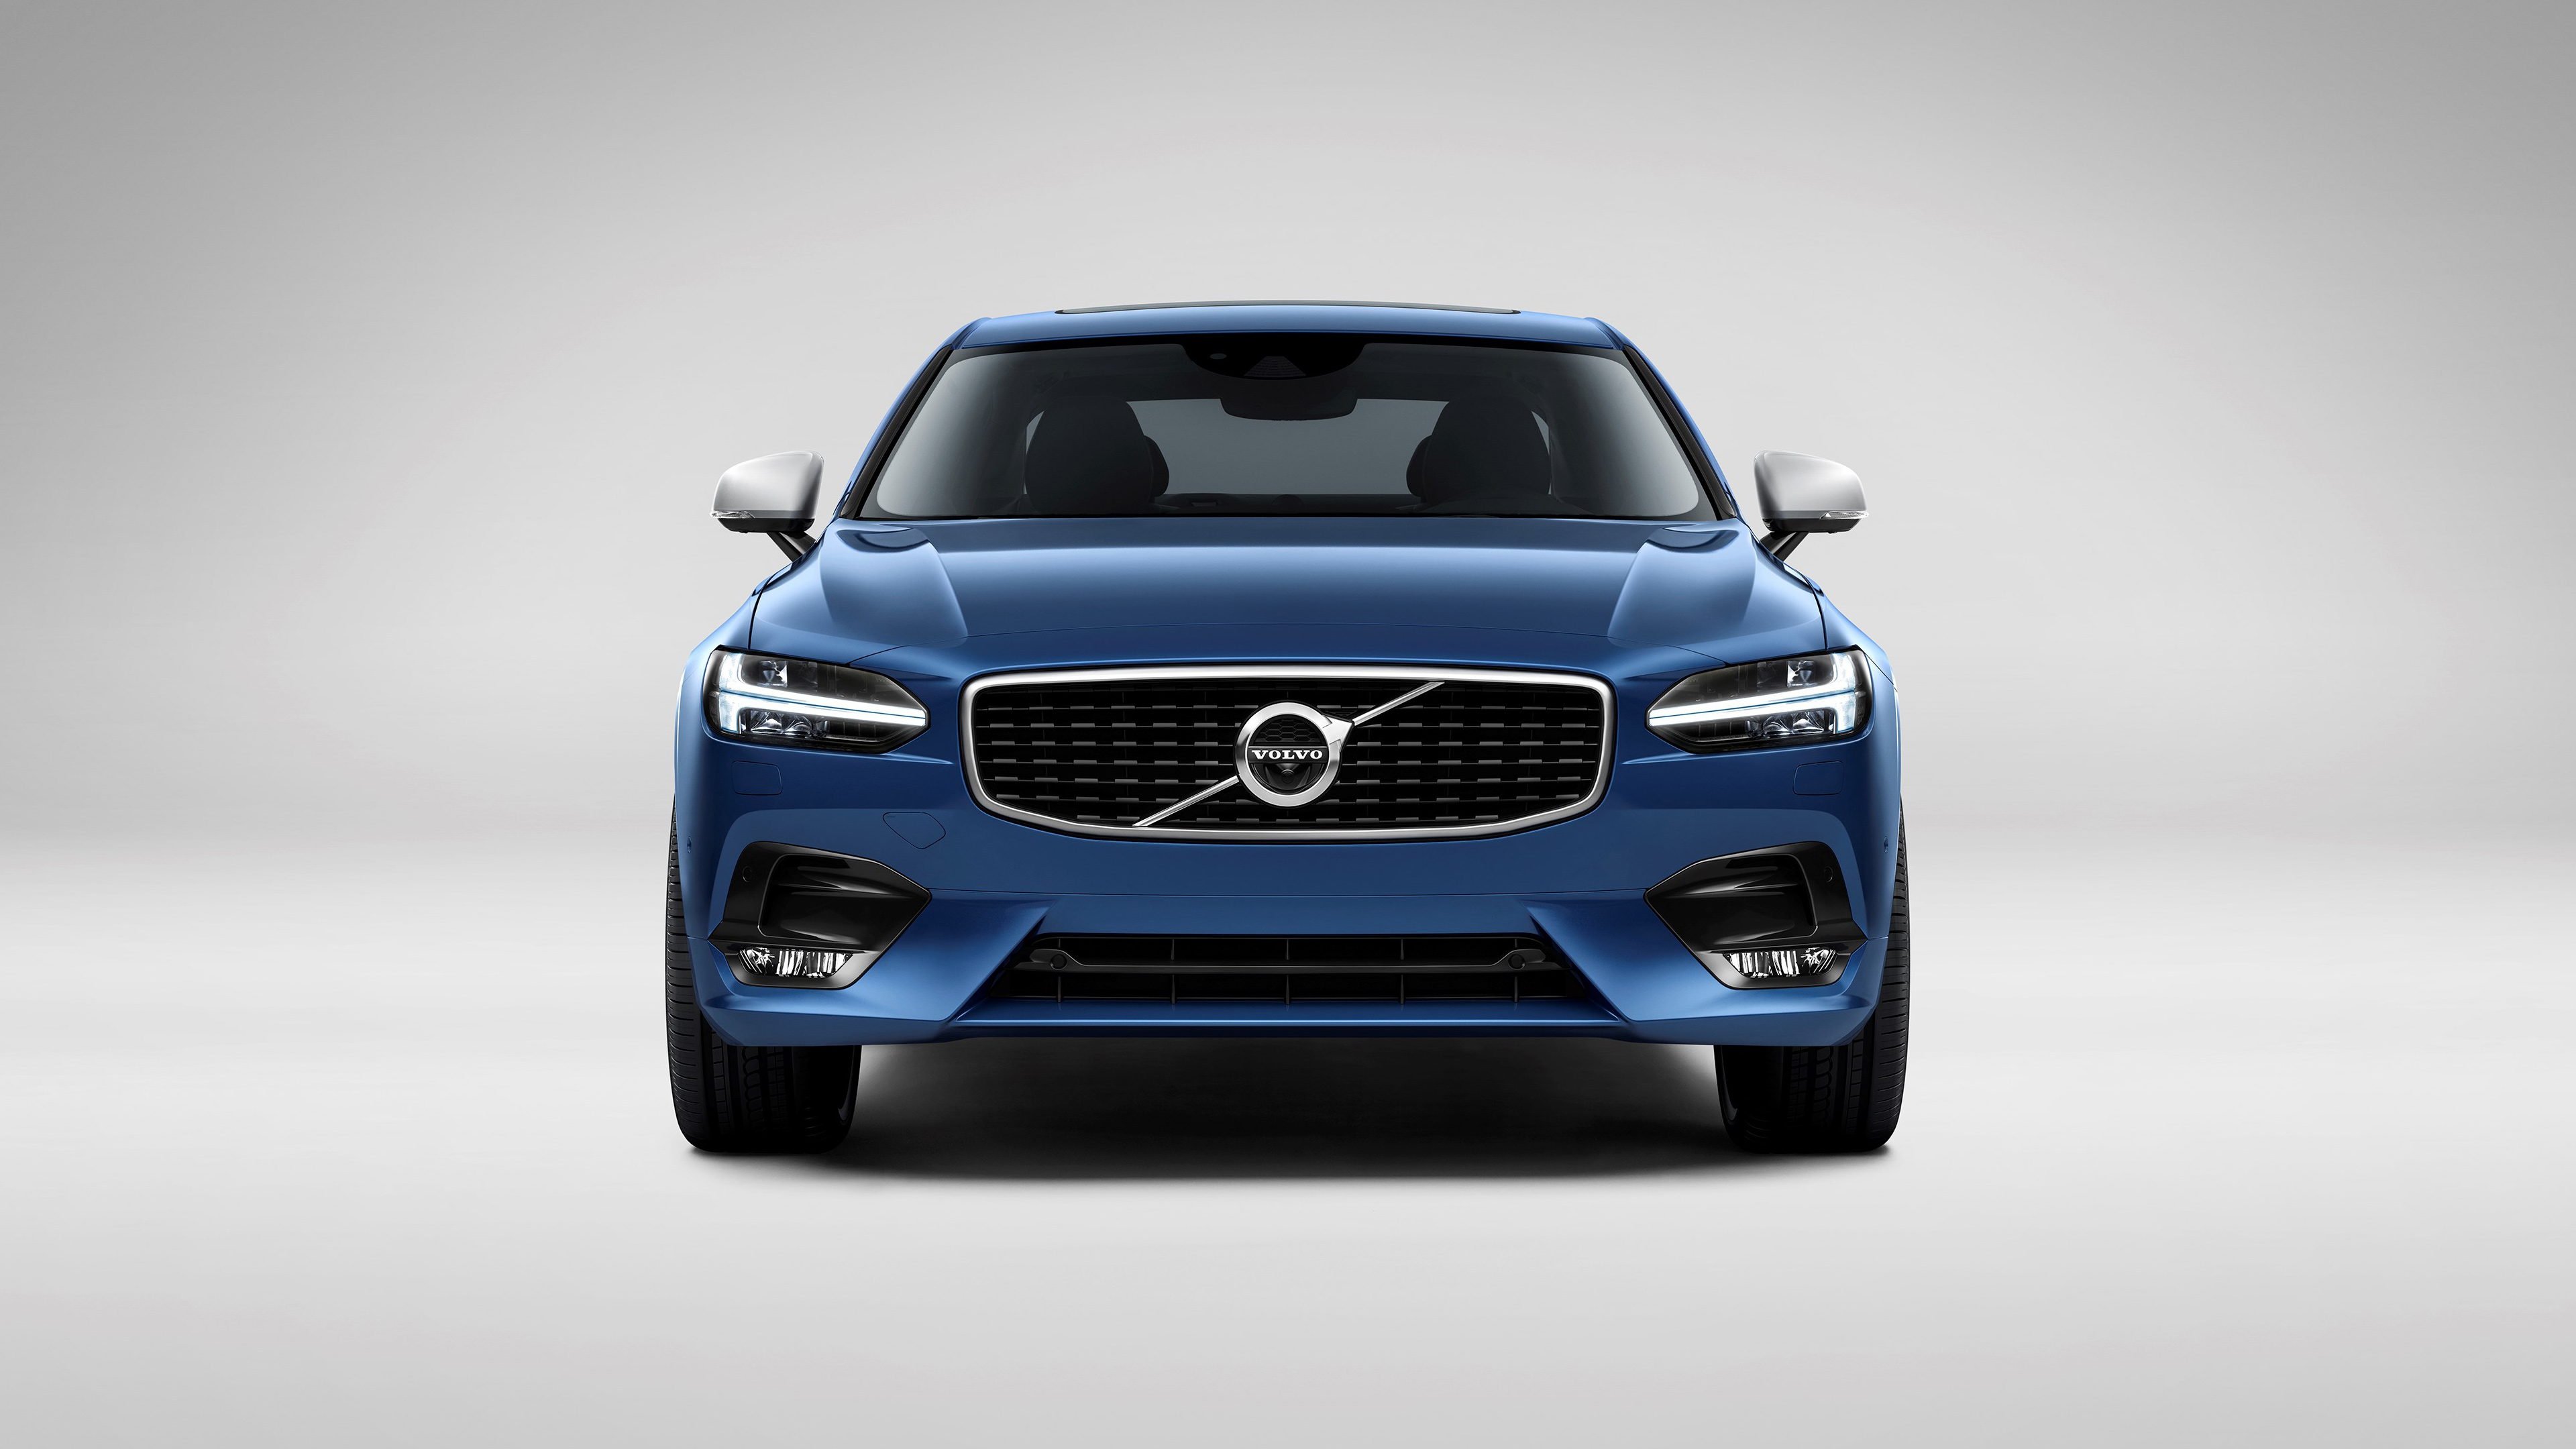 2016 Volvo V70 R 4K Wallpaper HD Car Wallpapers ID 6685 3840x2160